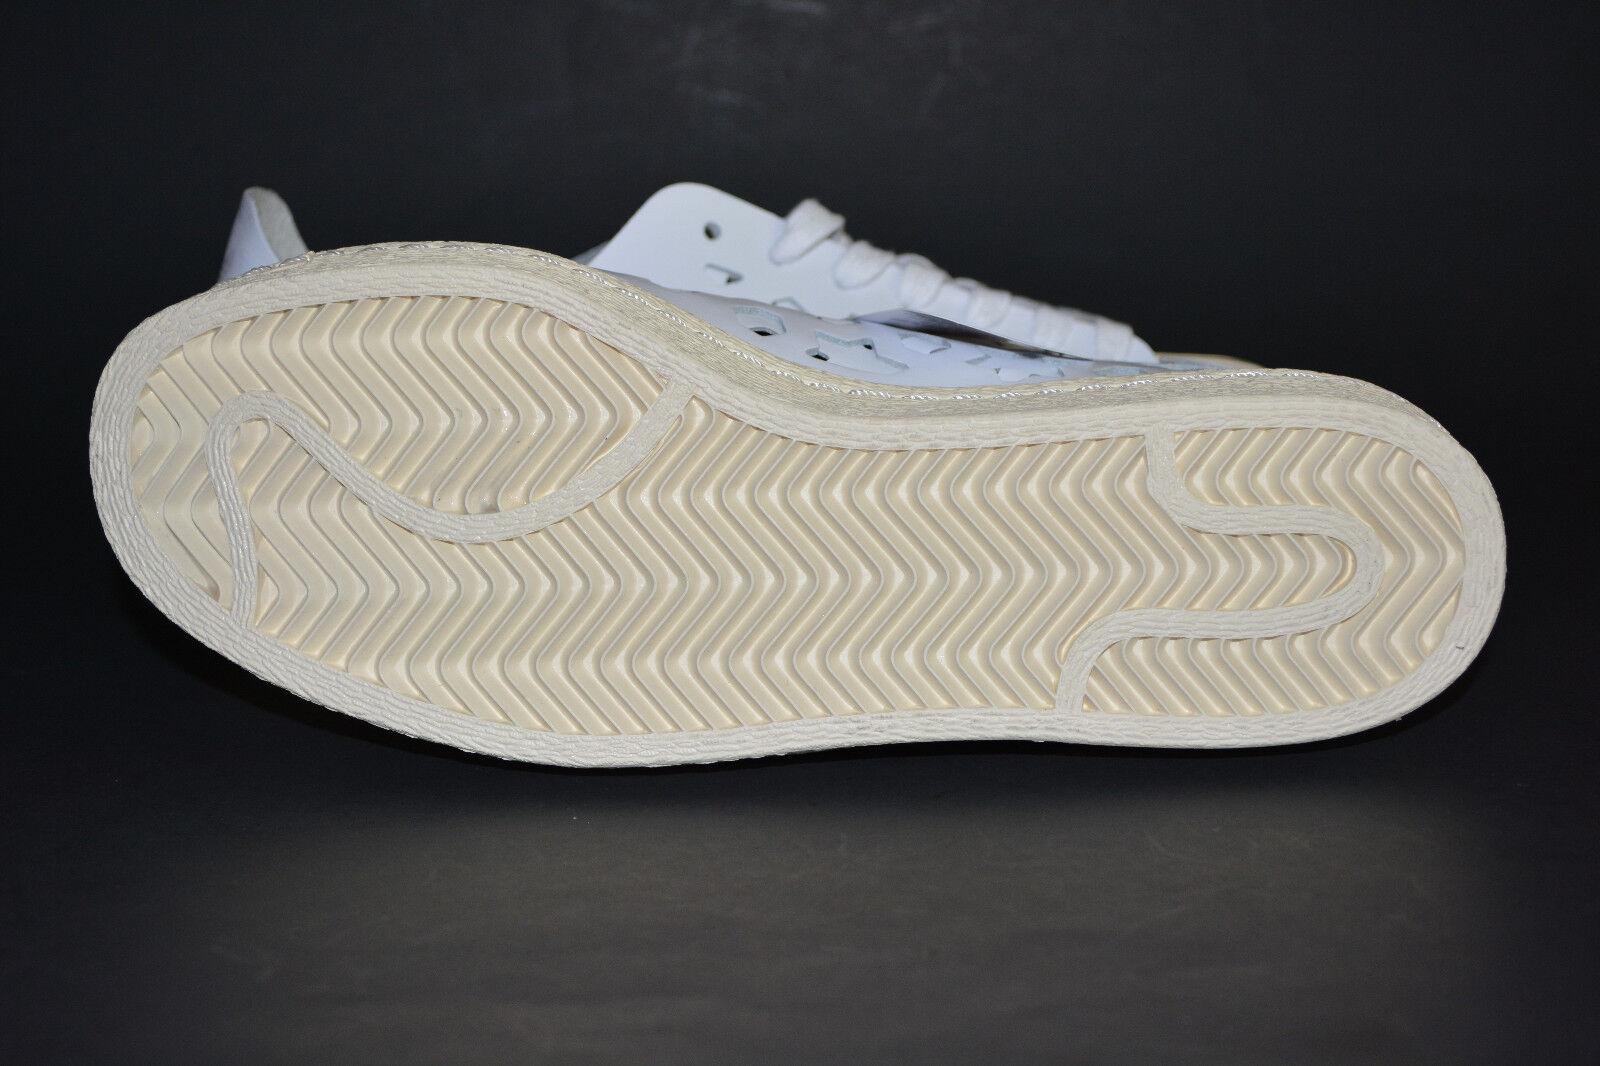 adidas lederschuhe originals superstar frauen 80 - ausschnitt lederschuhe adidas größe 7 weiße bb2129 ab8ef7